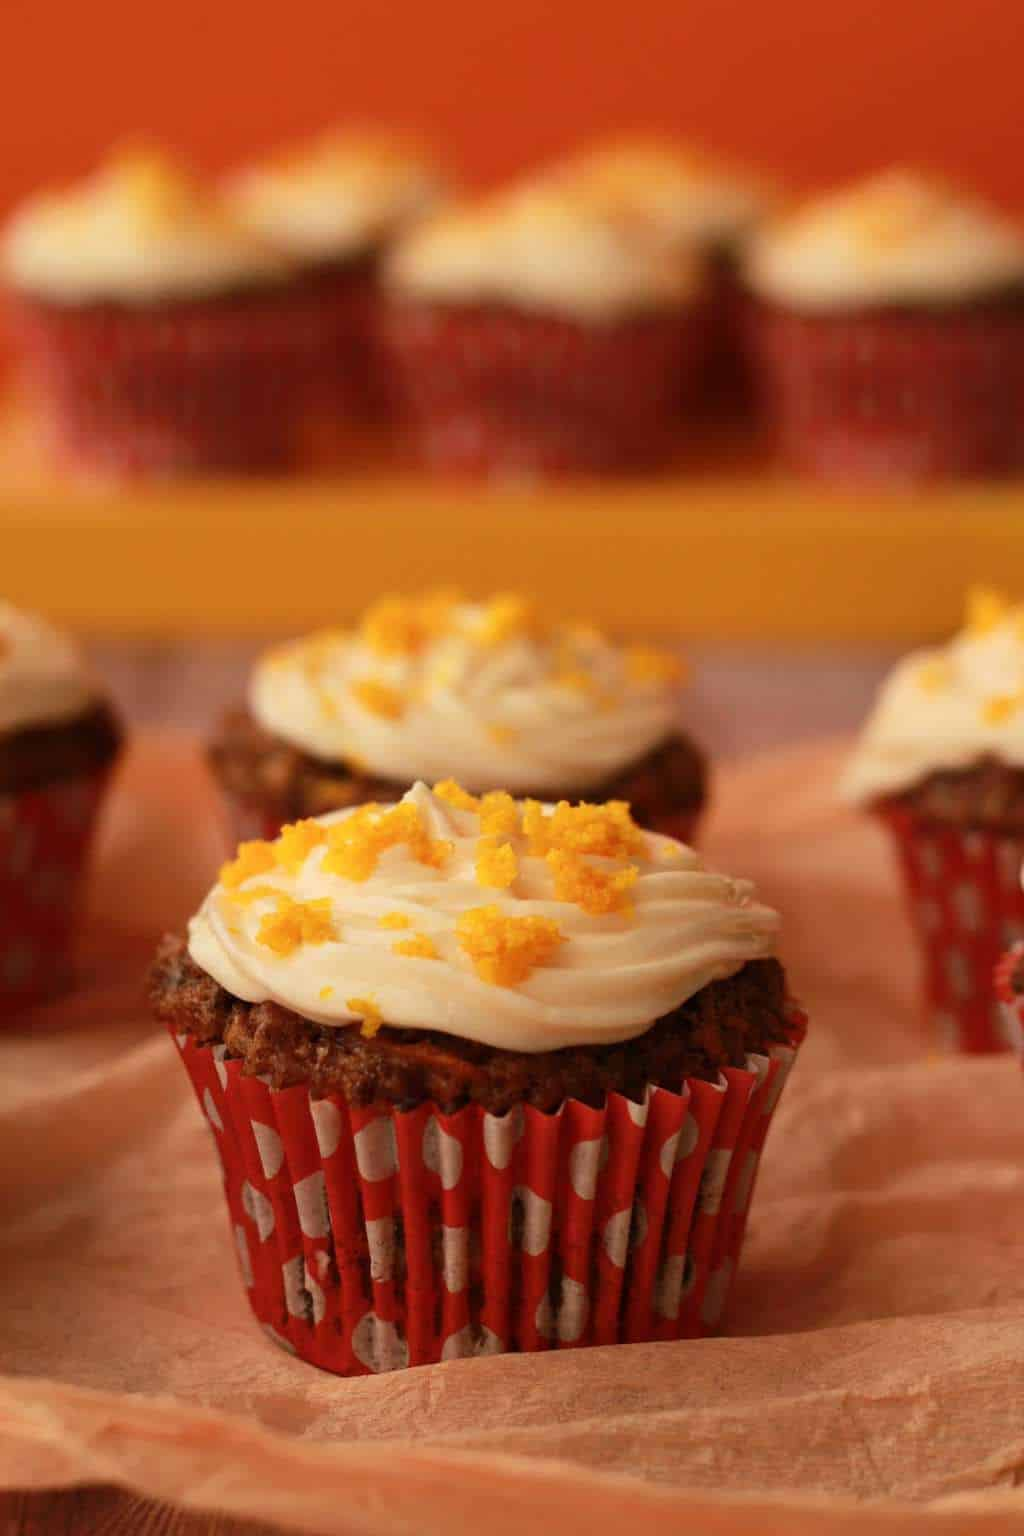 Vegan Carrot Cake Cupcakes Orange And Walnut Loving It Vegan